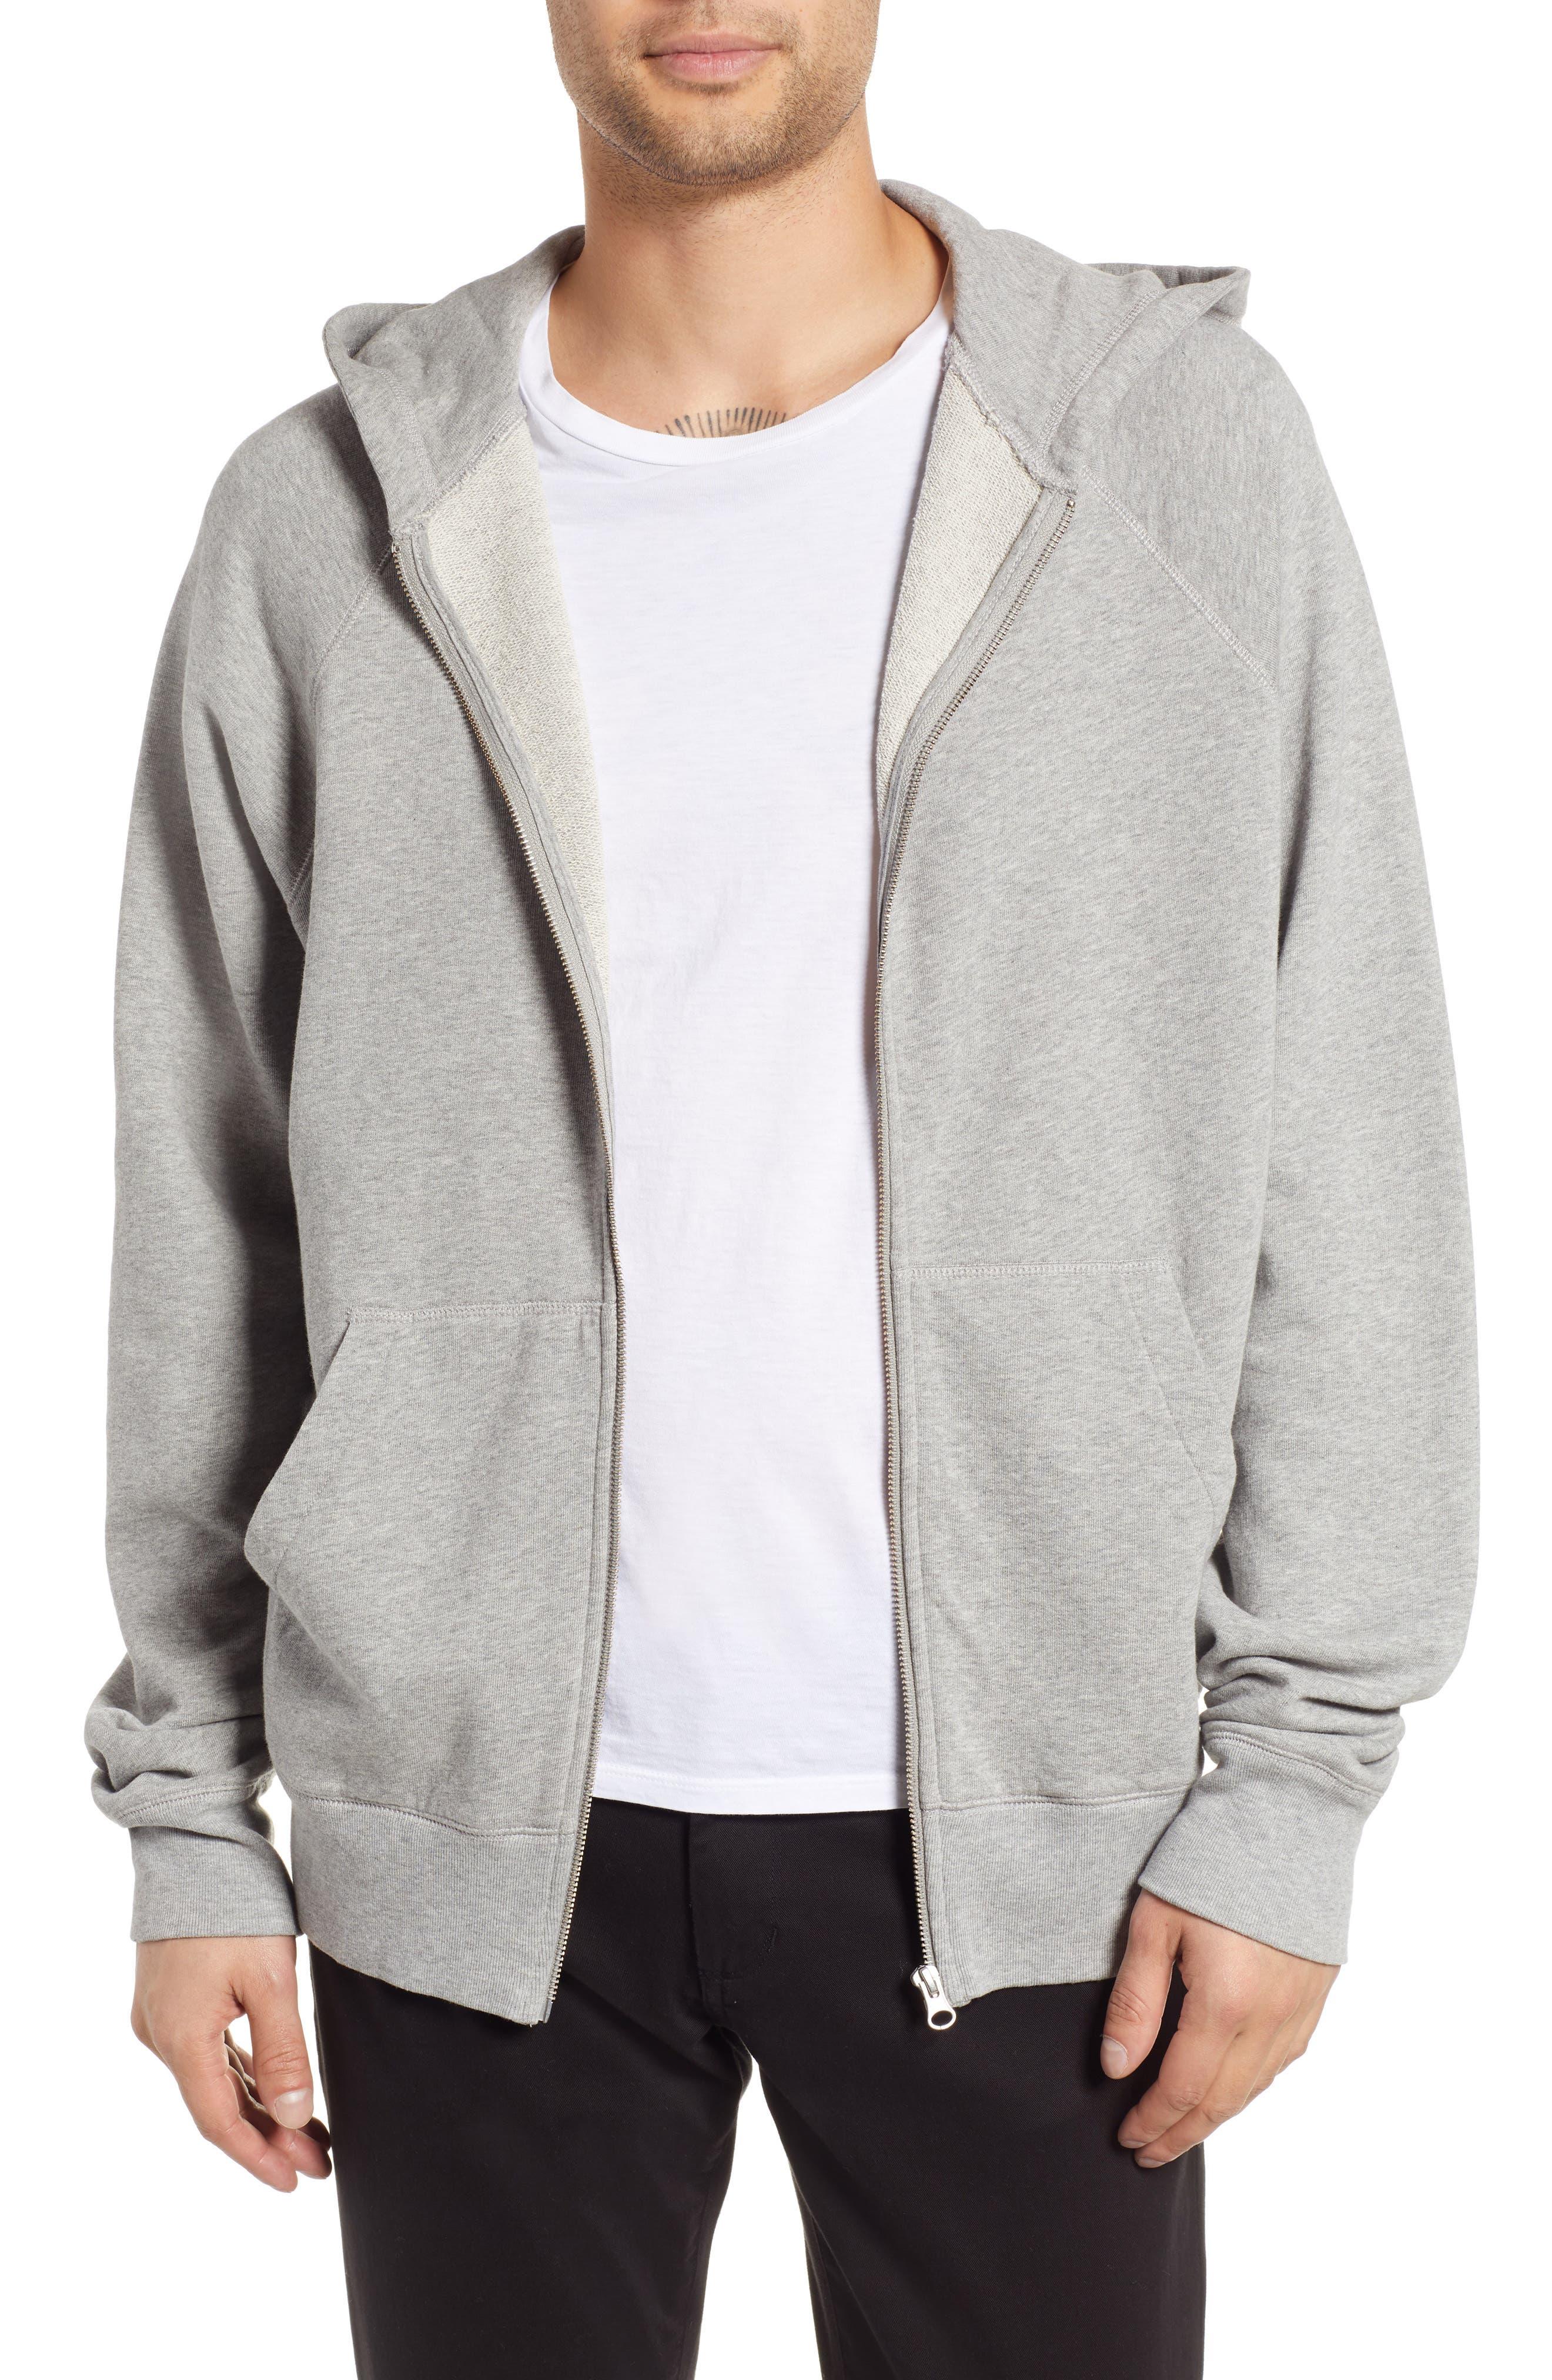 Pause Hooded Zip Sweatshirt,                             Main thumbnail 1, color,                             GREY MELANGE